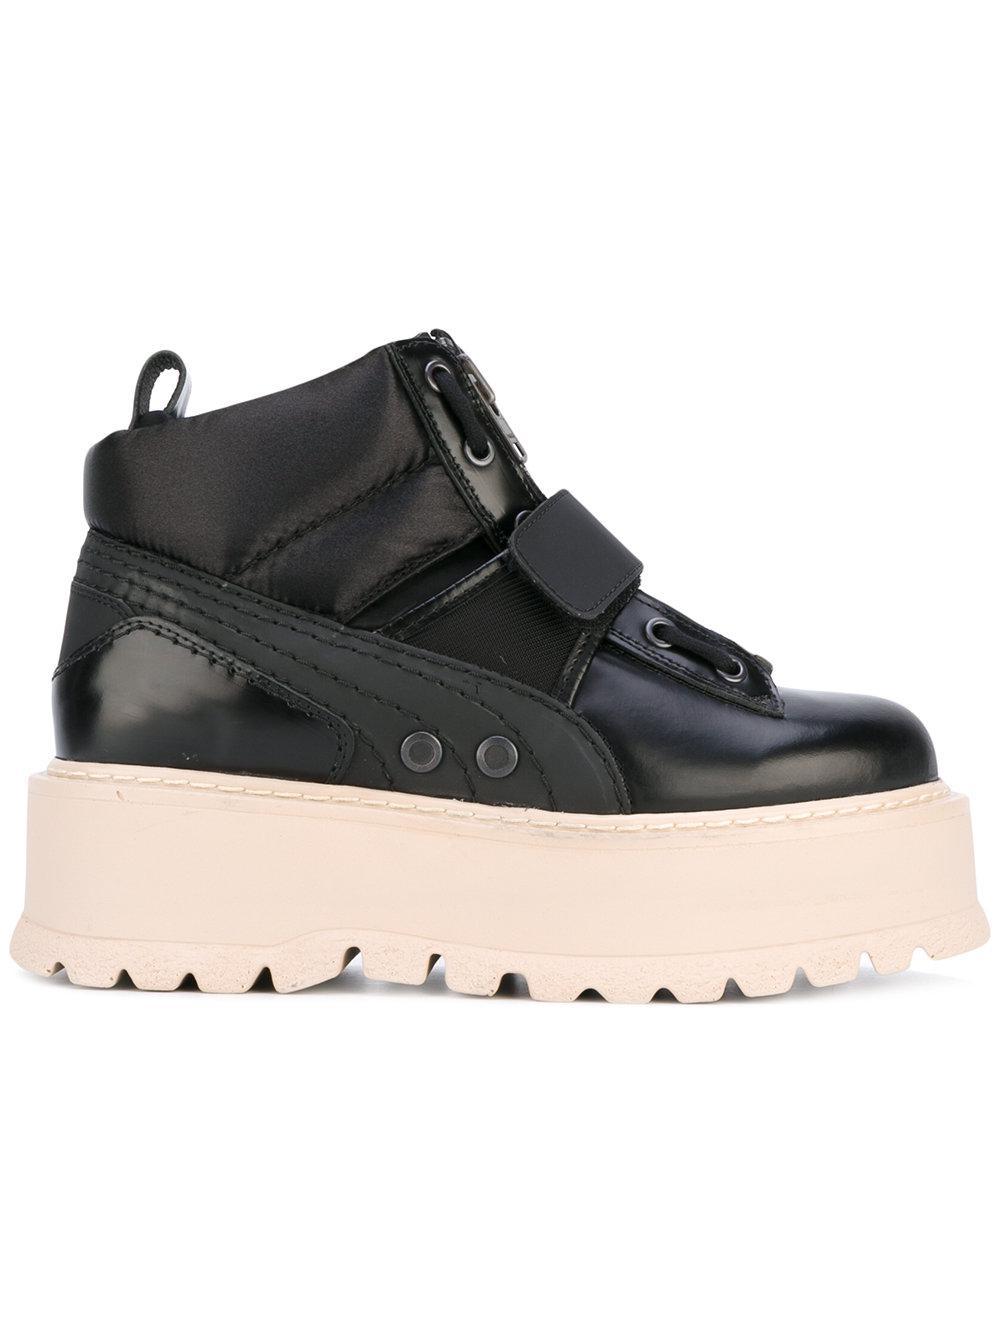 Lyst - Puma Fenty Sneaker Boots in Black 1060be2da